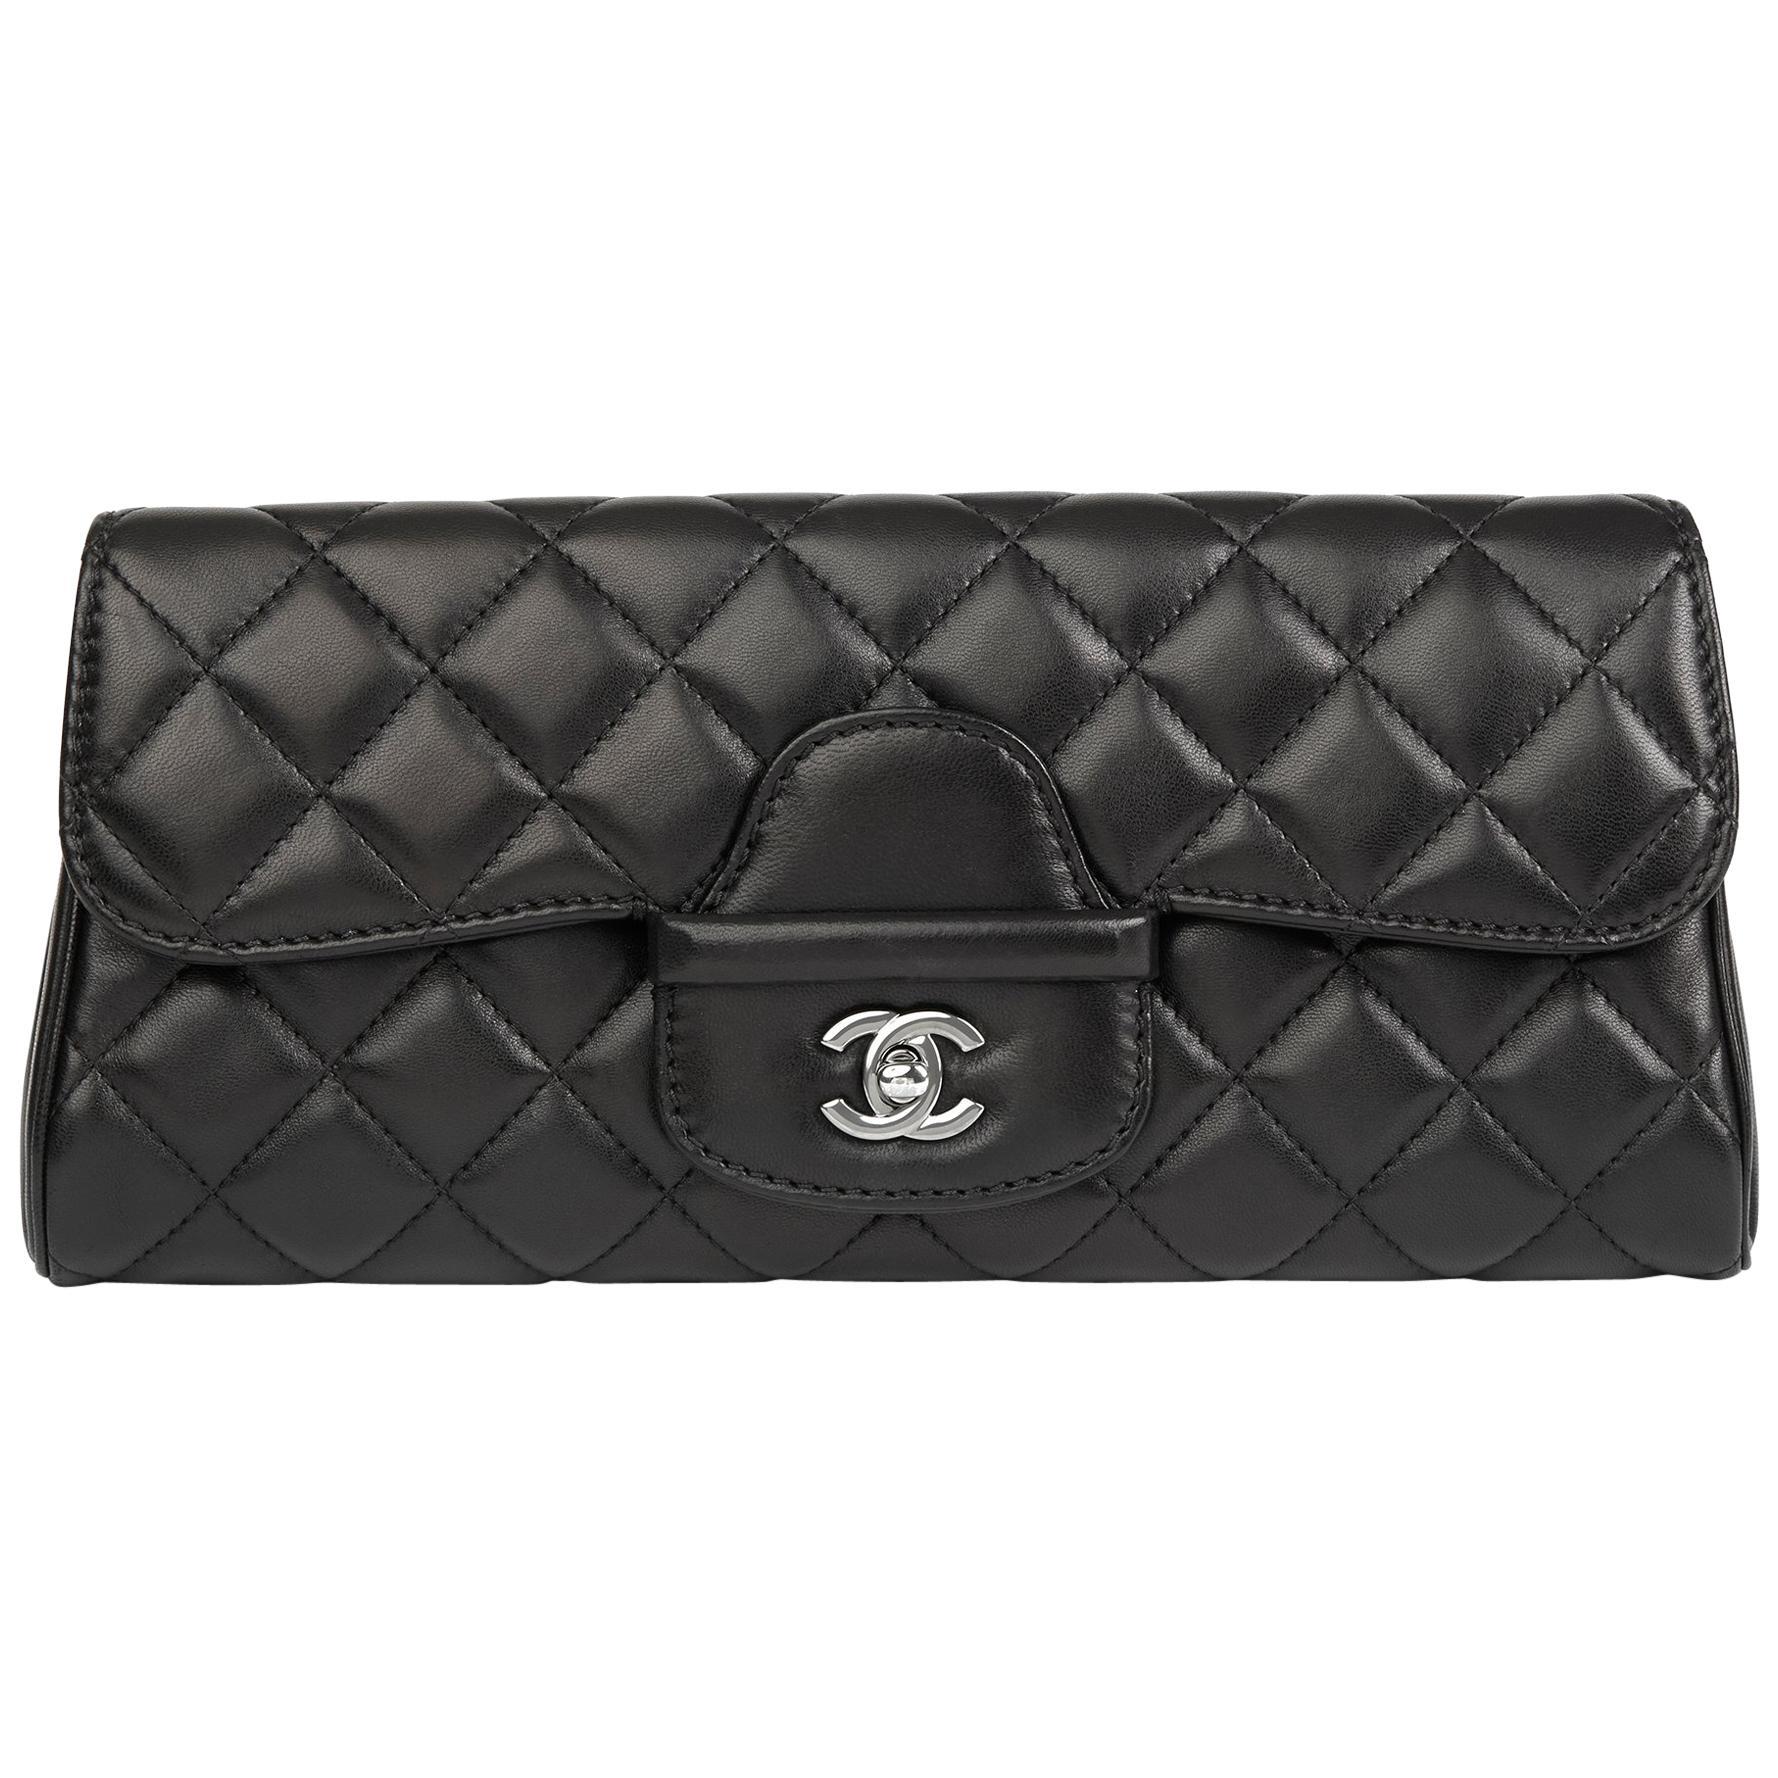 af63966b3962 CHANEL wallet HOT pink caviar zippy NEW box crazy fabulous at 1stdibs